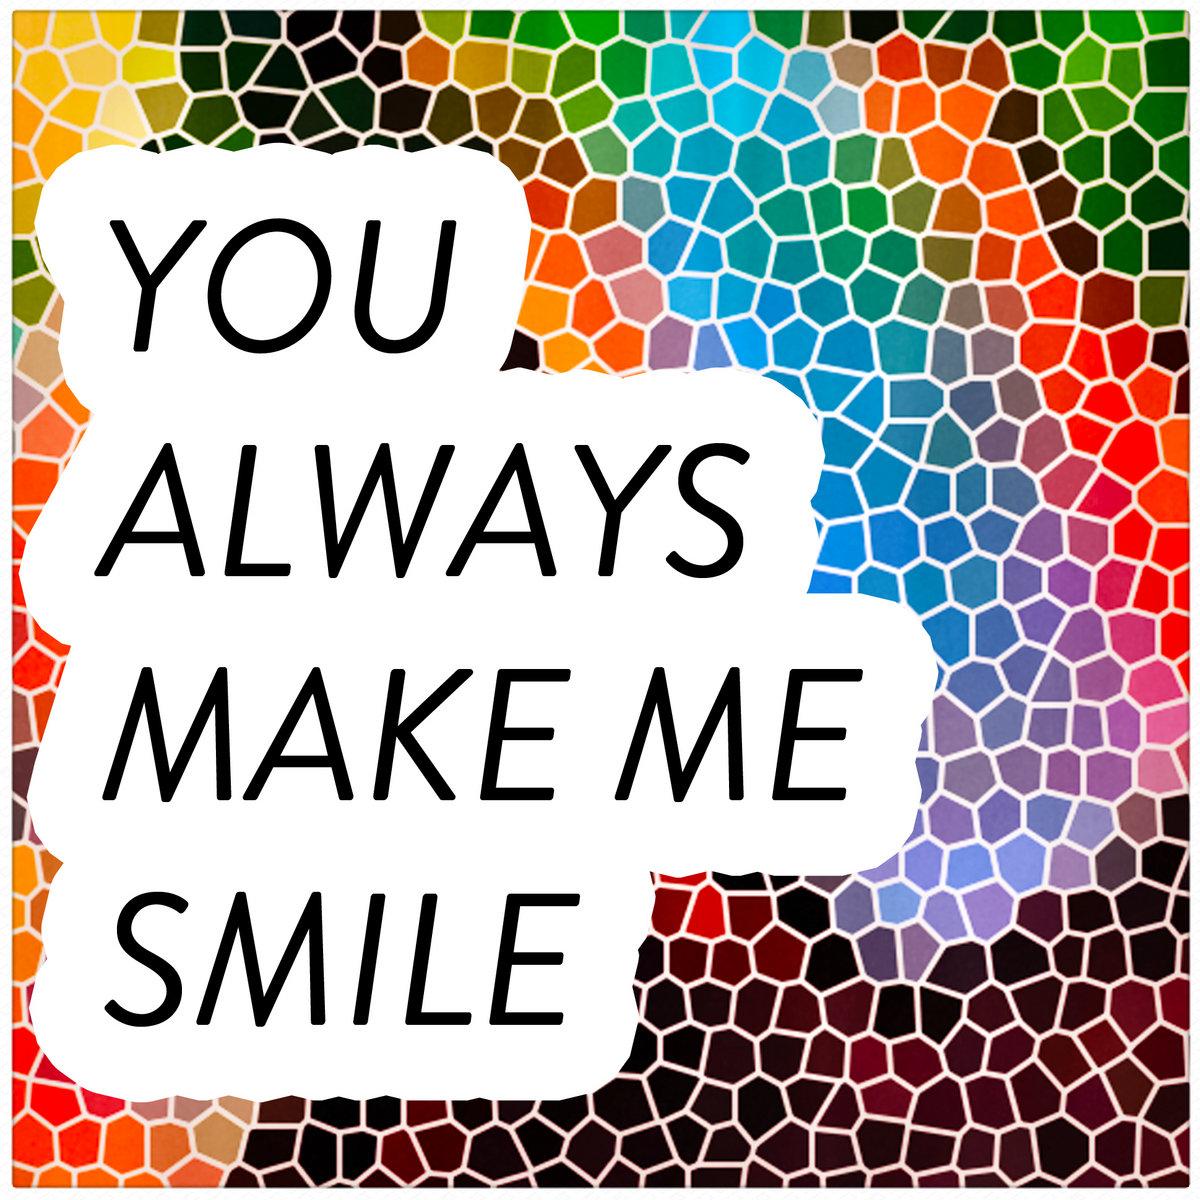 U Always Make Me Smile Quotes: You Always Make Me Smile